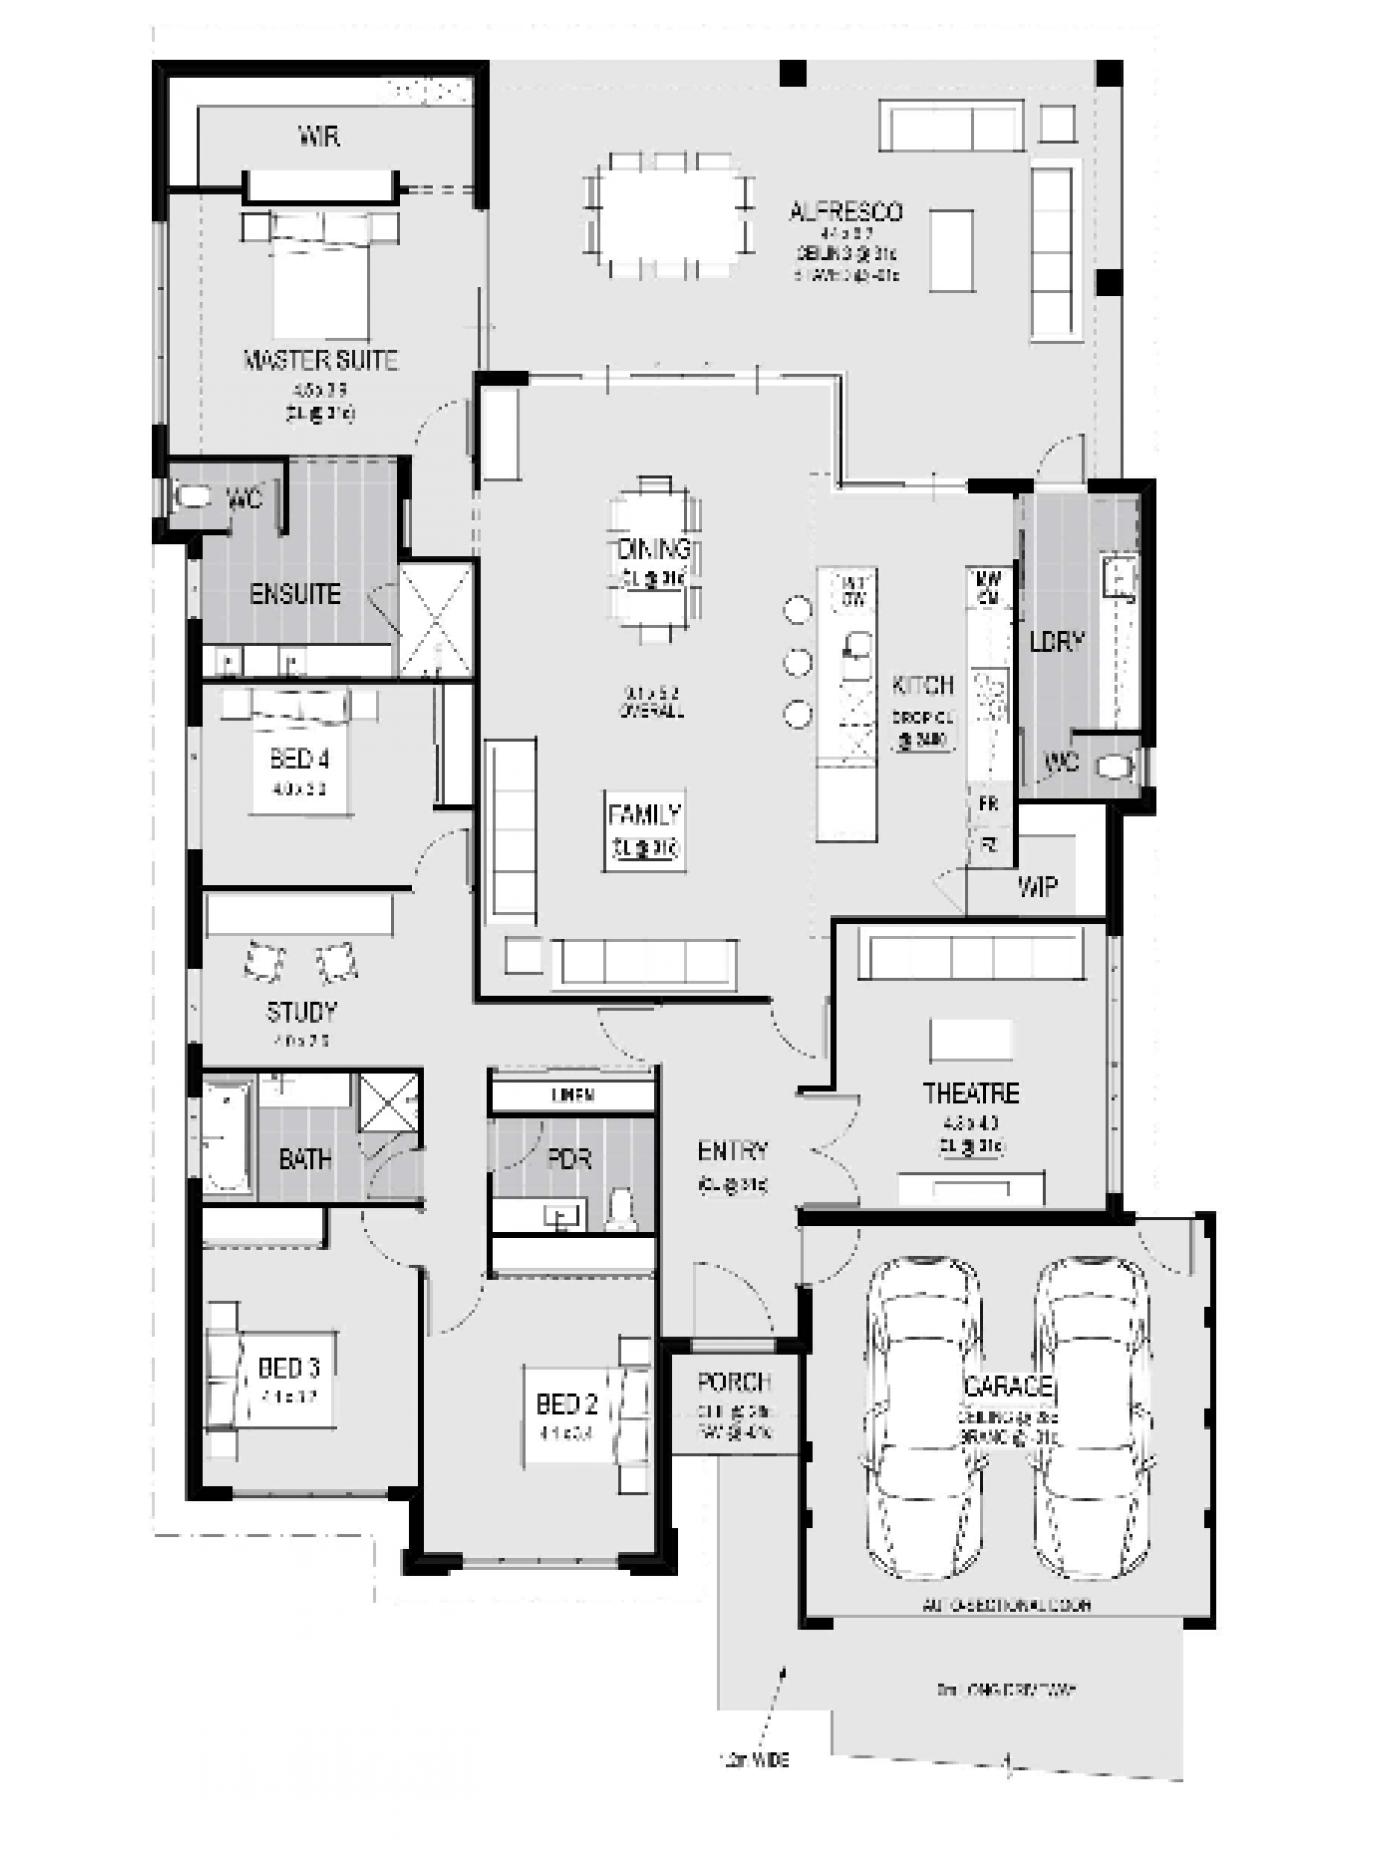 Modena Single Storey Home Design Master Floor Plan Wa Design Floor Home Master Modena Plan Sin Apartment Floor Plans Floor Plan Design House Layouts